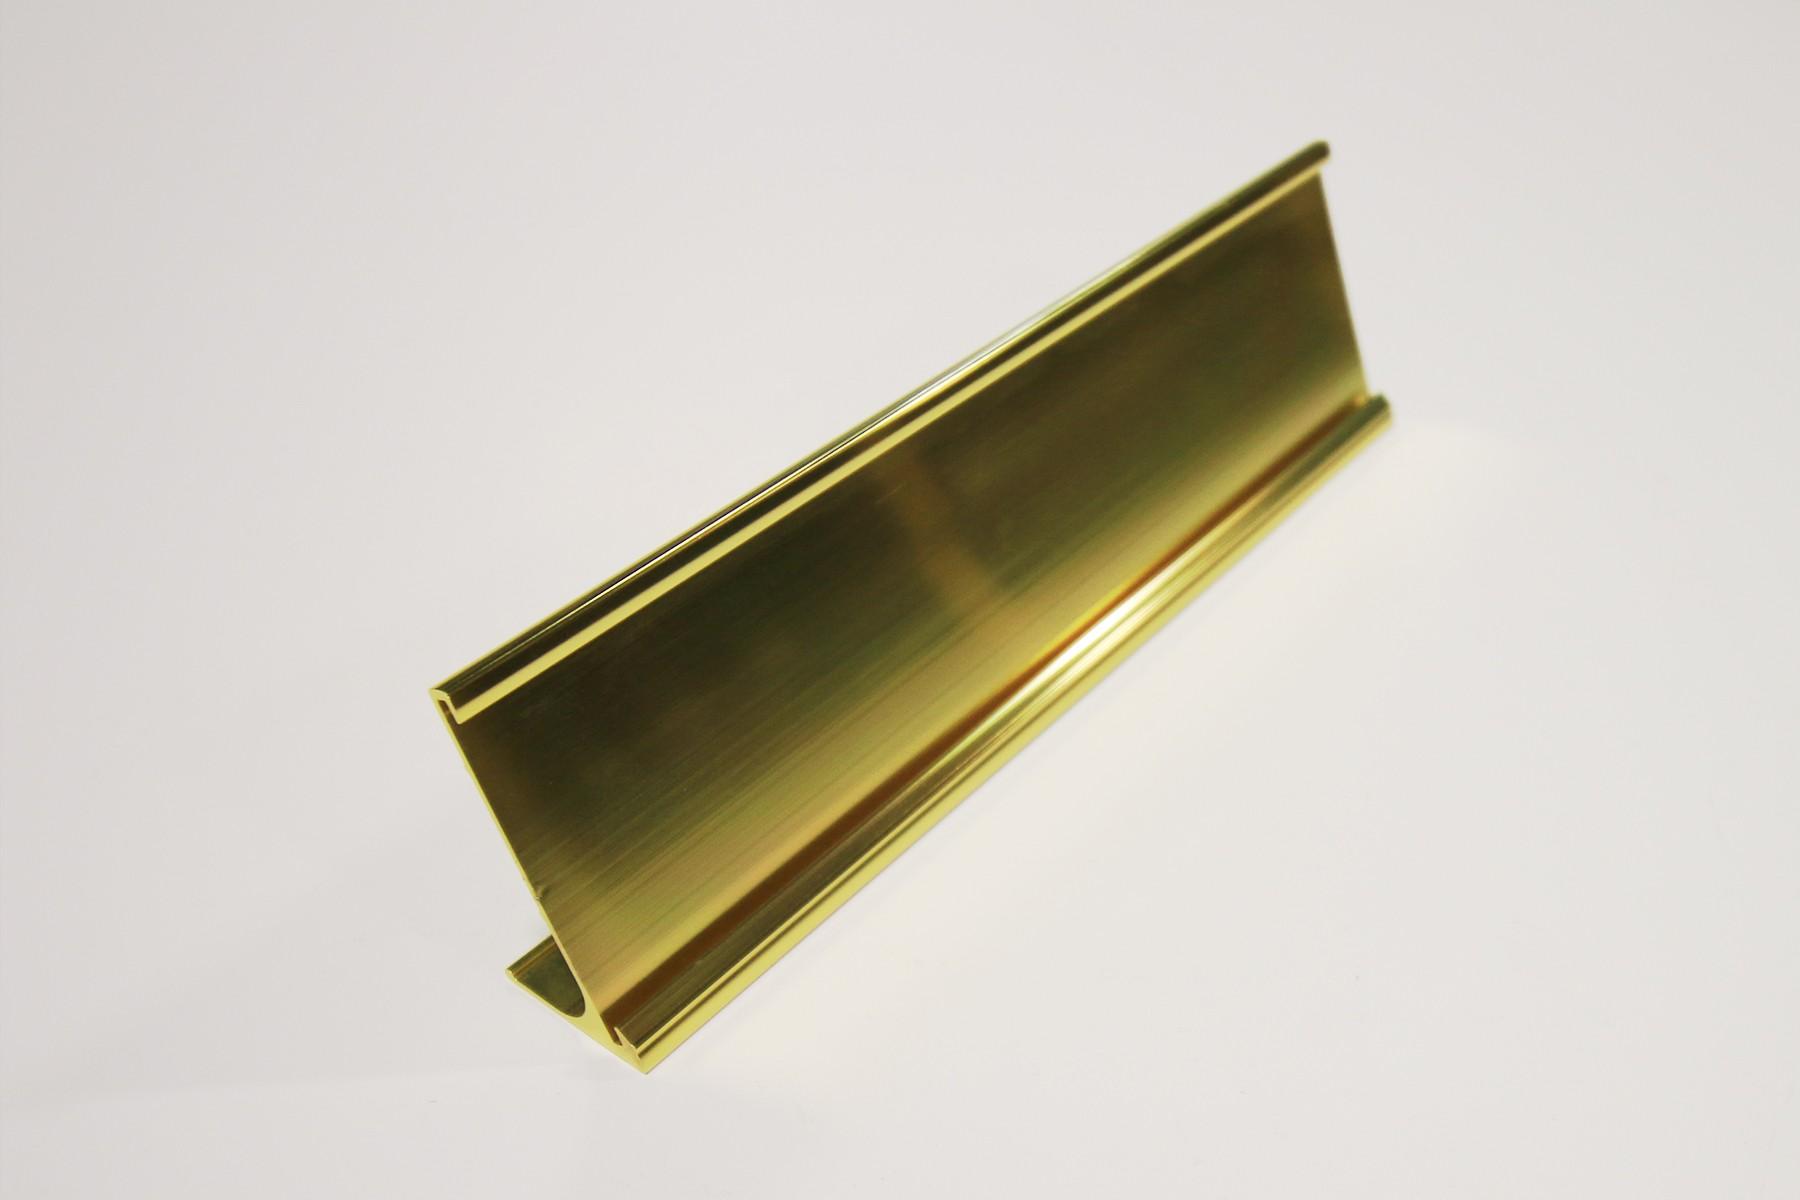 2 x 8 Desk Holder, Bright Yellow Gold